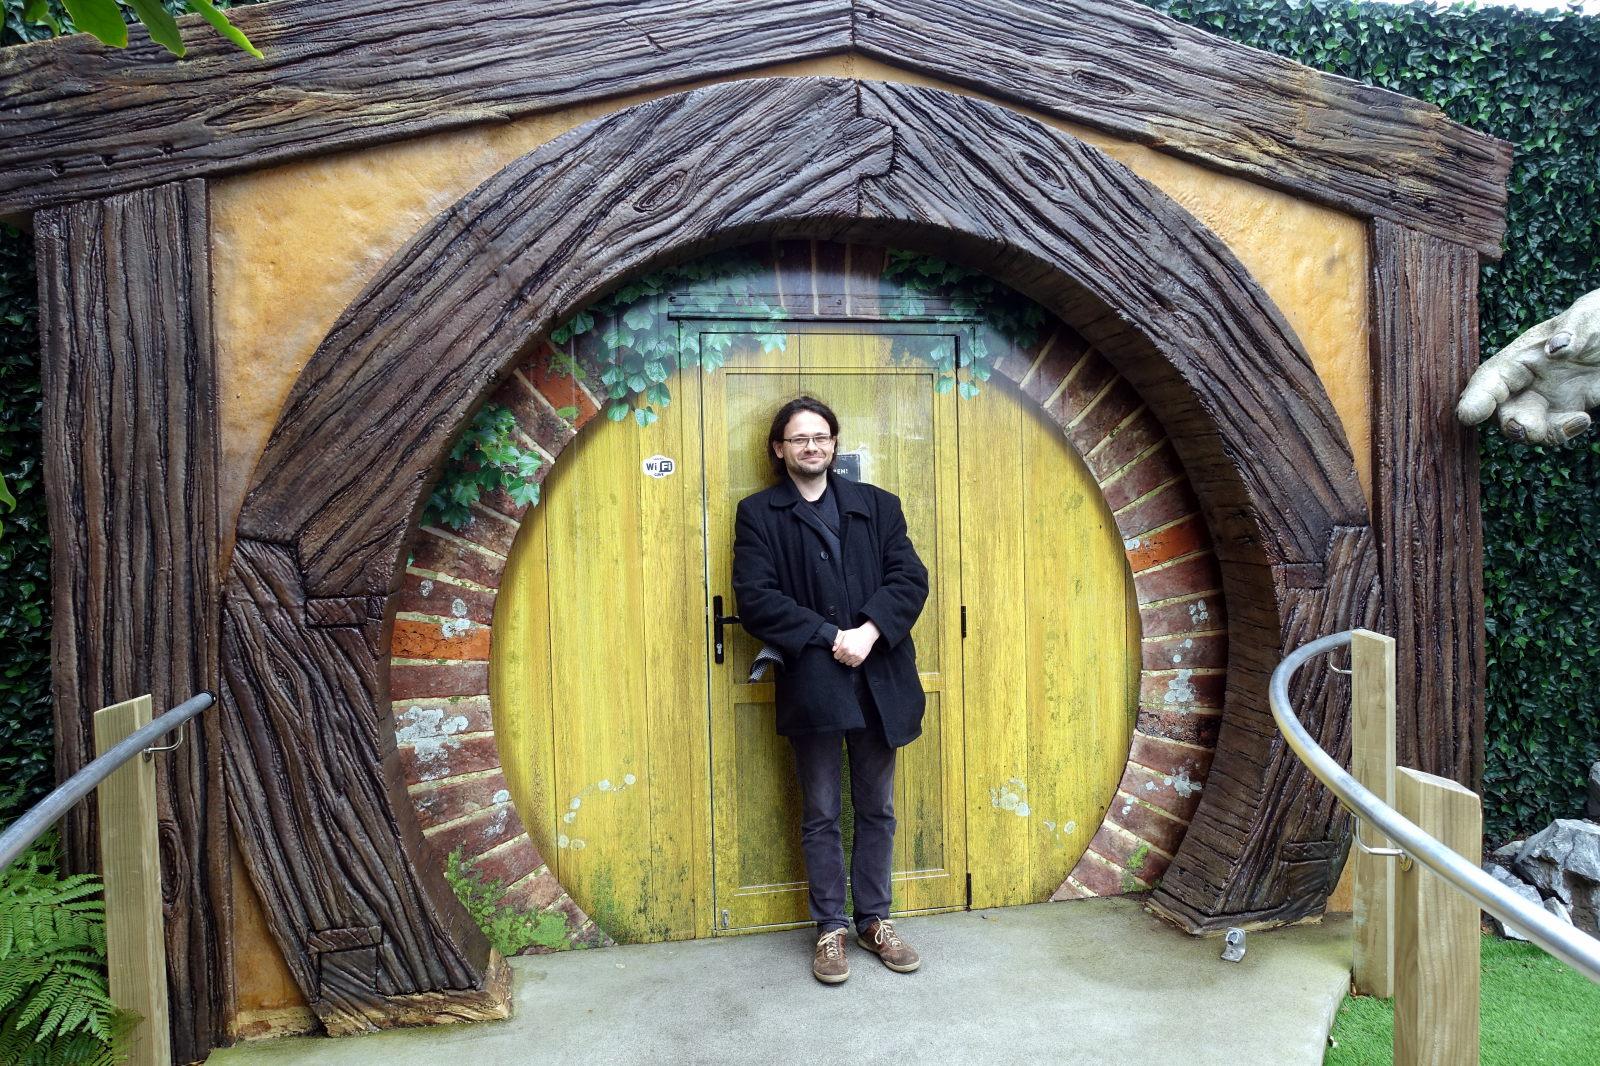 Man standing in front of the door to a hobbit hole.